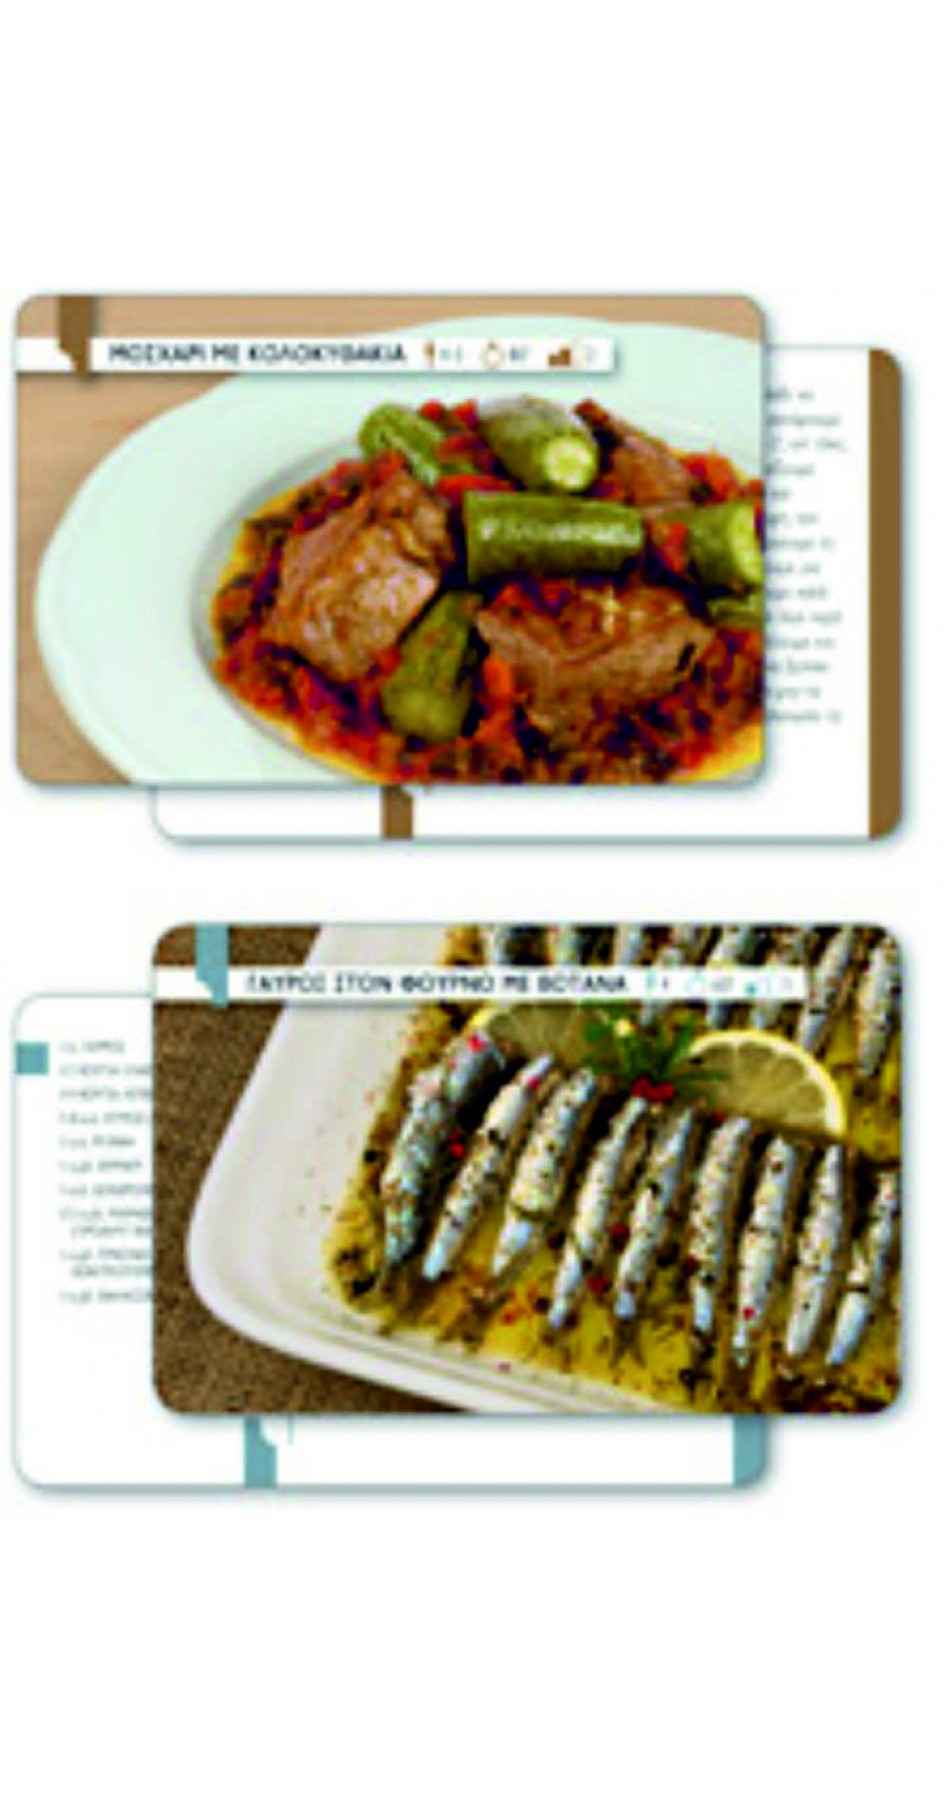 Greek Cuisine: Greek traditional recipes in 50 cards